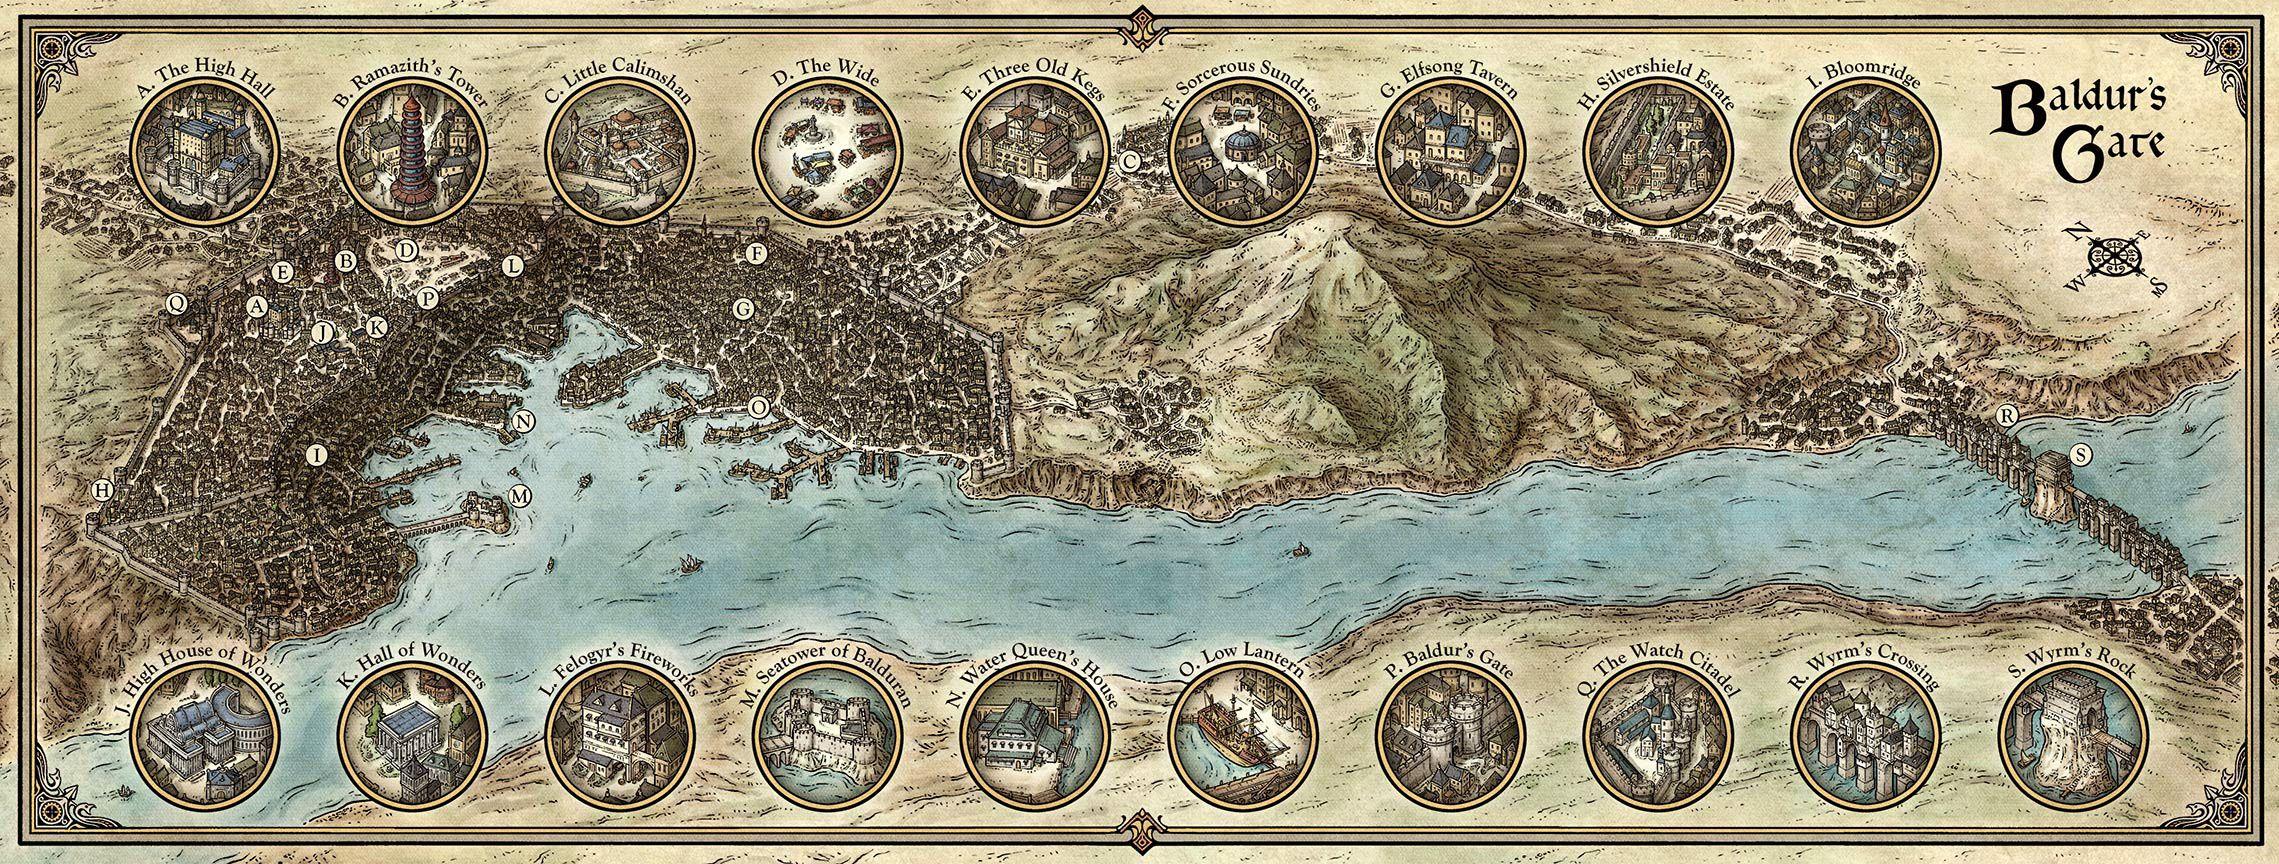 Baldurs Gate Map